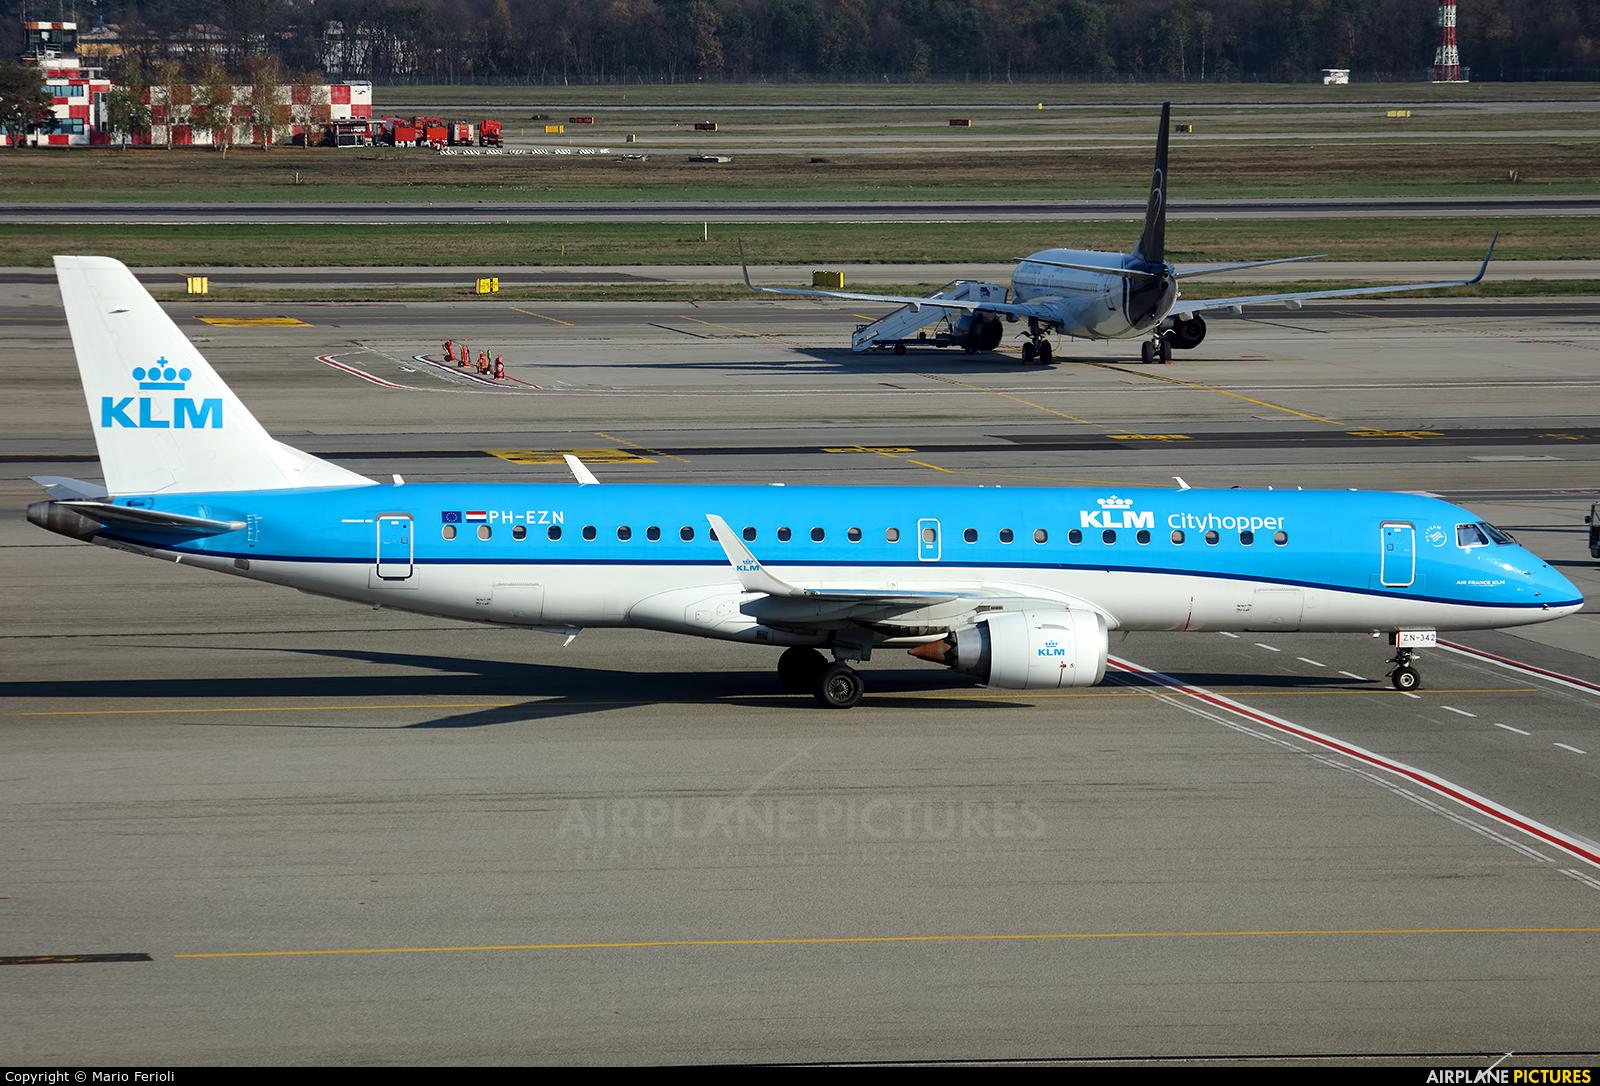 KLM Cityhopper PH-EZN aircraft at Milan - Malpensa